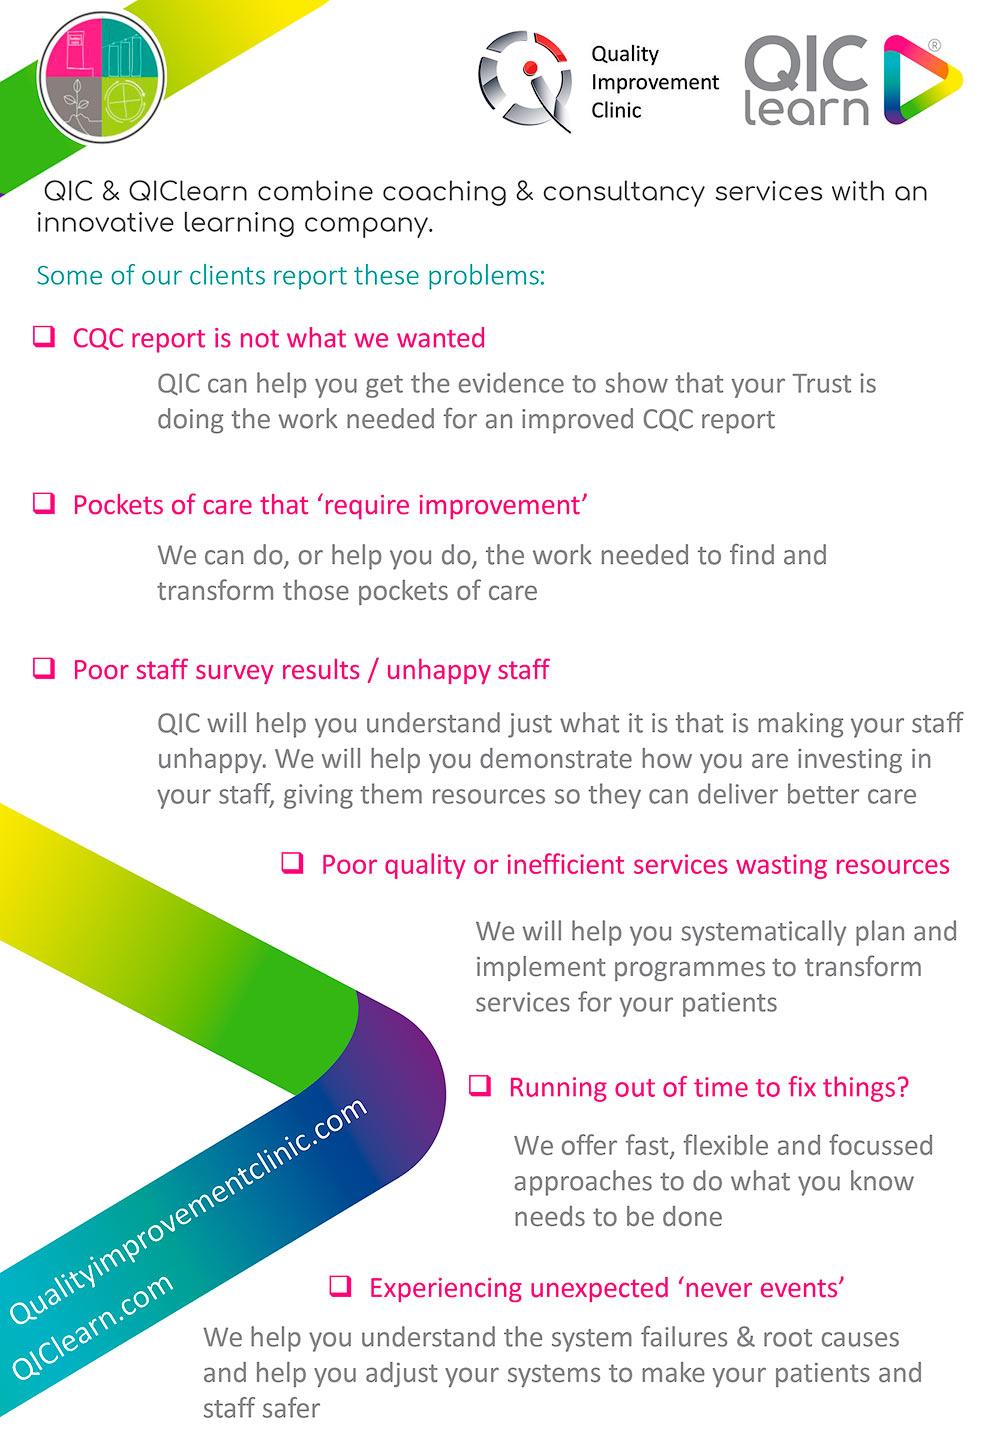 How QIC Can Help | Quality Improvement Clinic